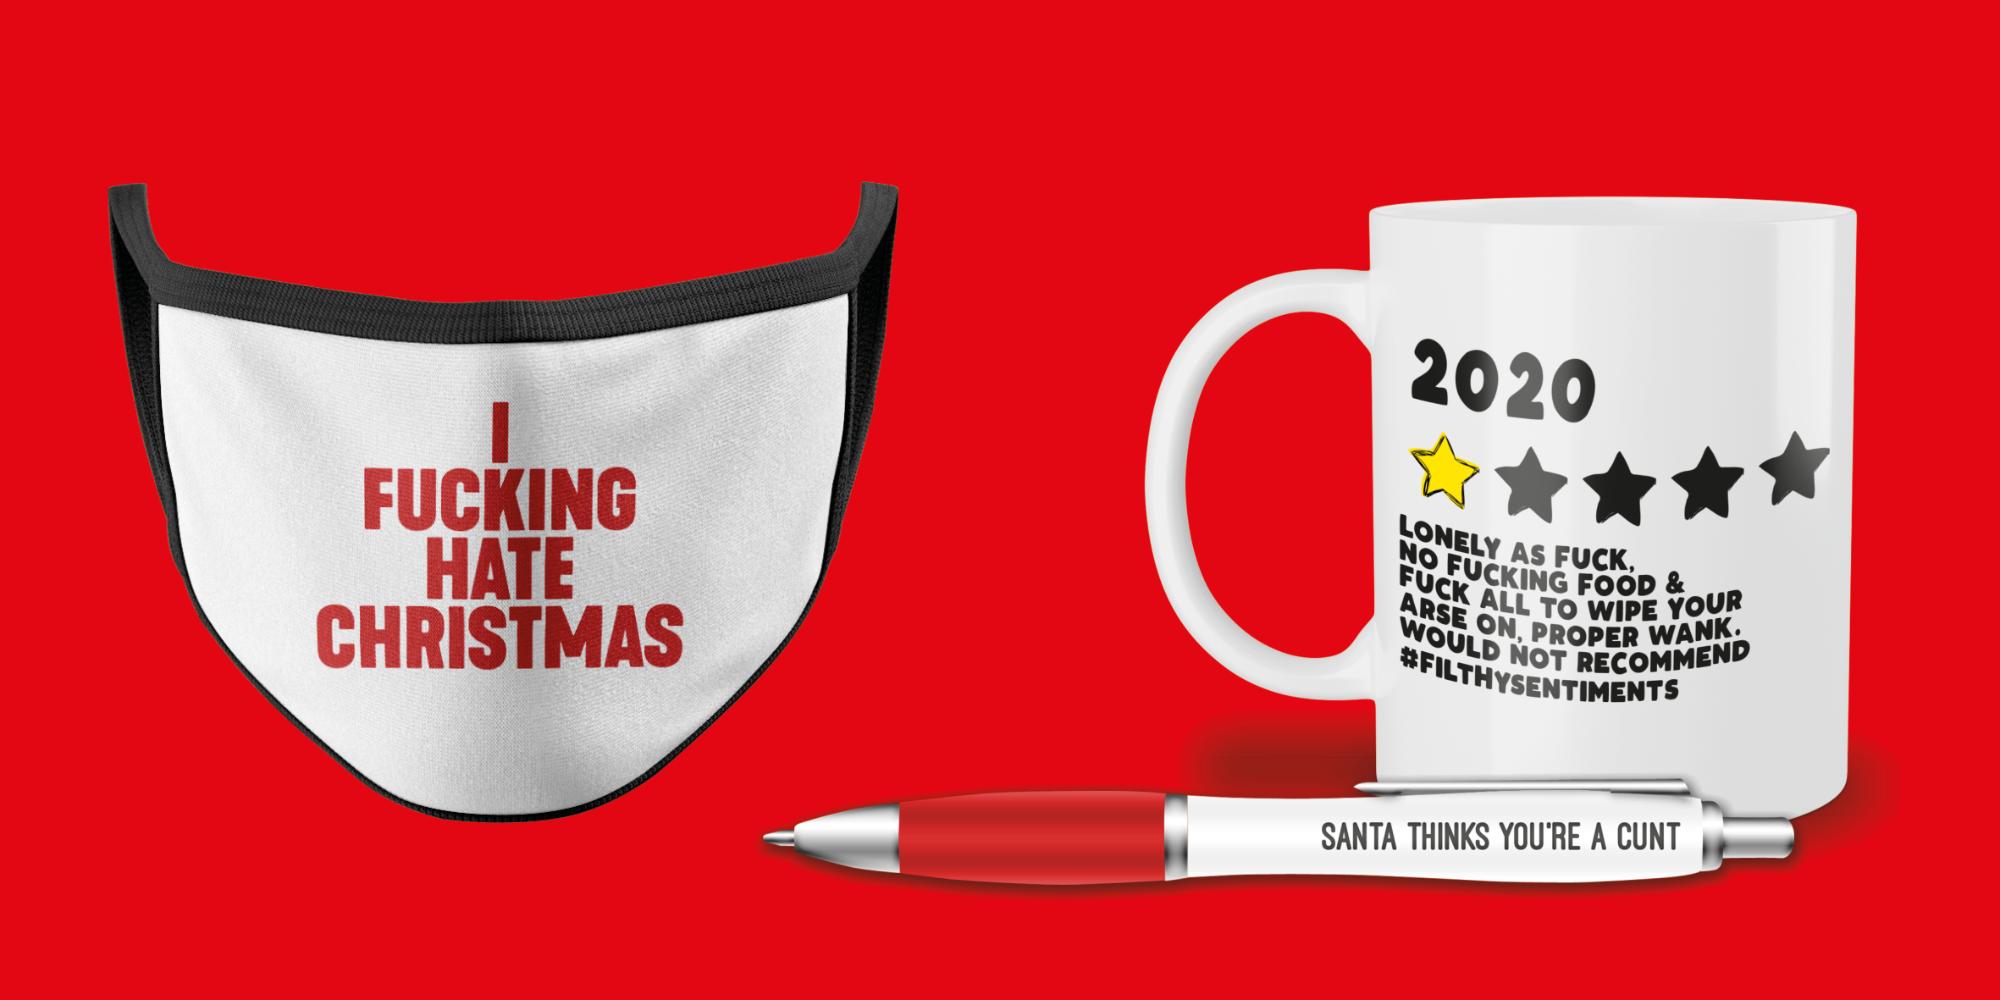 Lockdown Christmas gift ideas